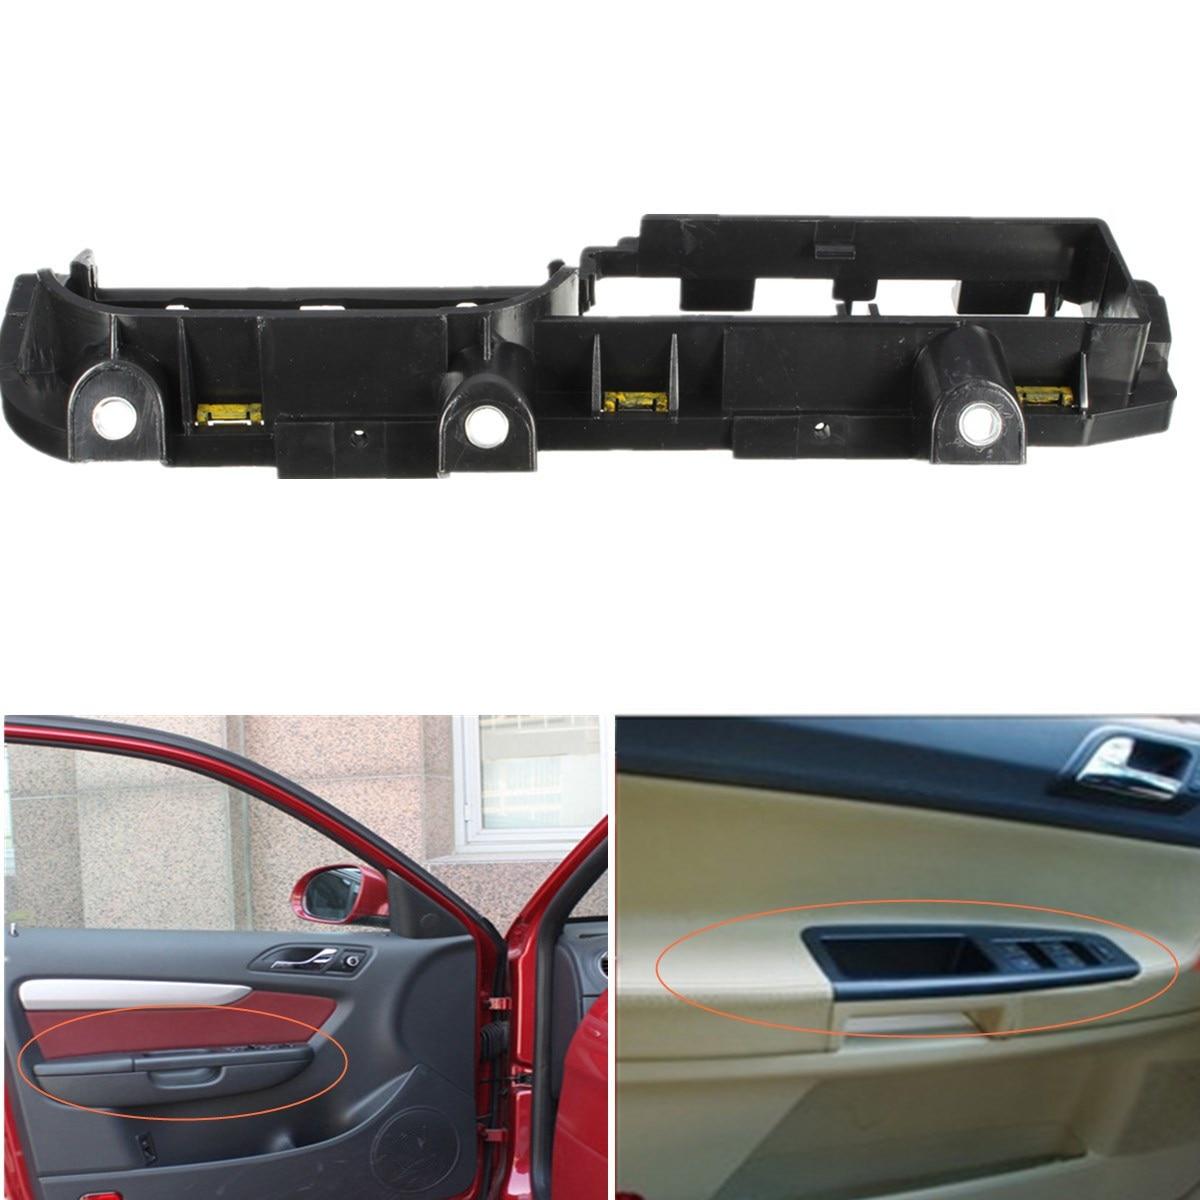 1Pc Front Pull Left Interior Door Grab Handle Bracket for VW Jetta Bora Golf MK4 1999 2000 2001 2002 2003 2004 2005